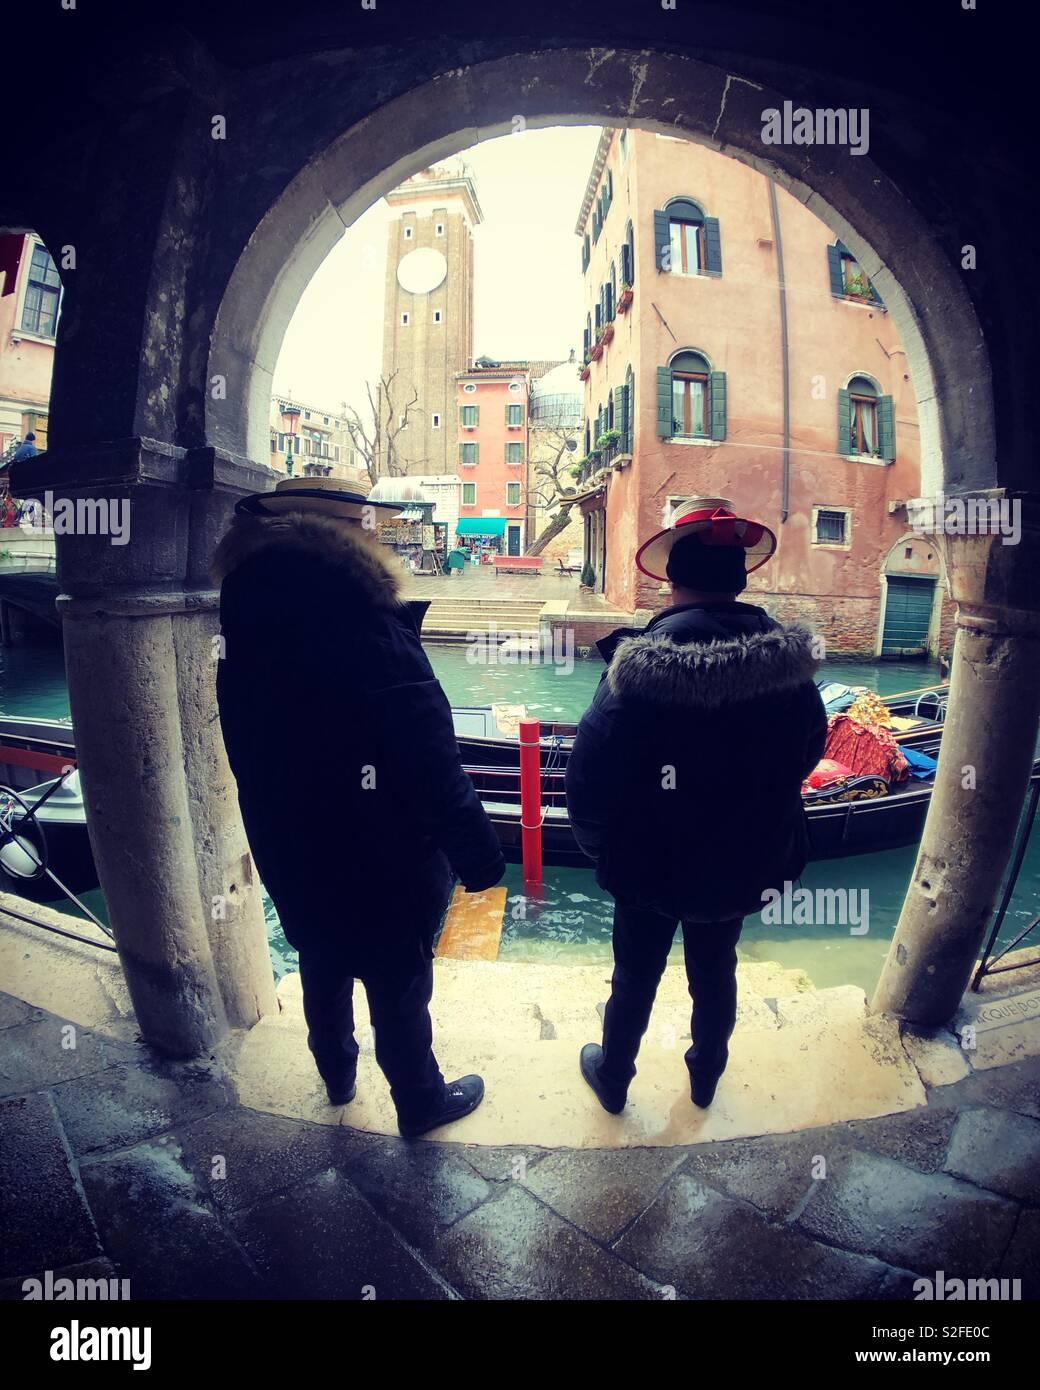 Gondolieri in attesa di una tariffa Foto Stock